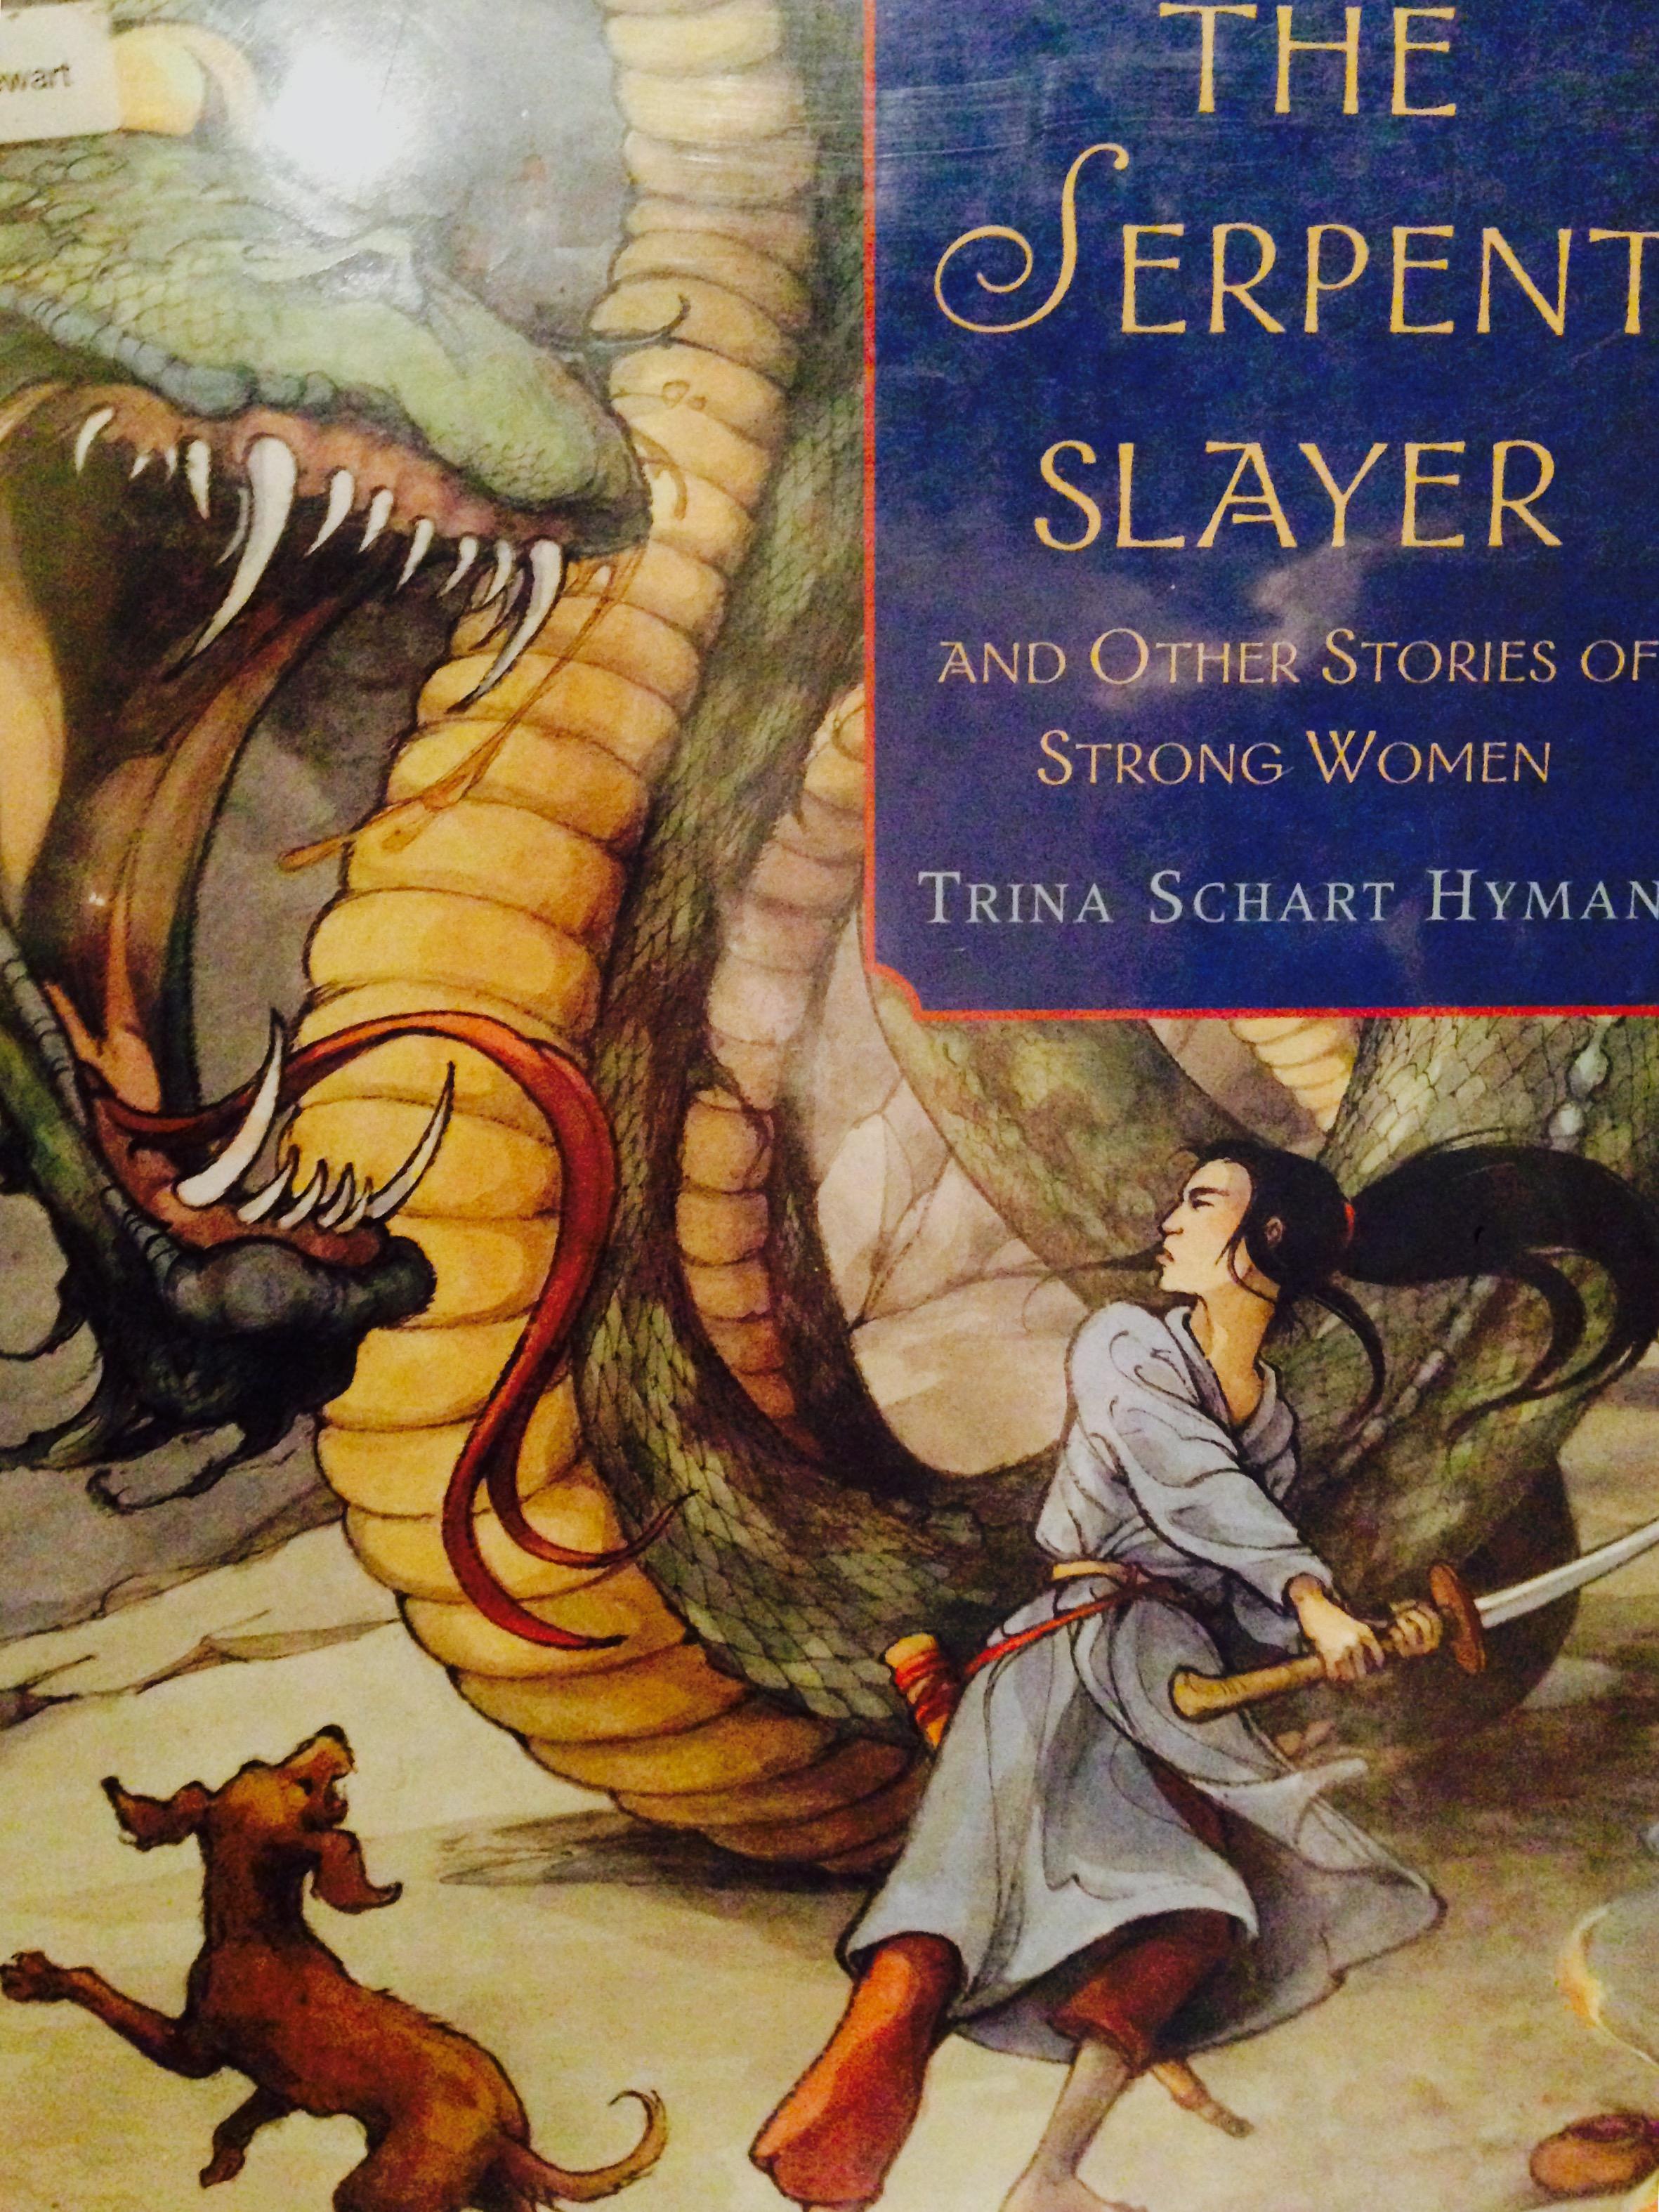 serpent_slayer